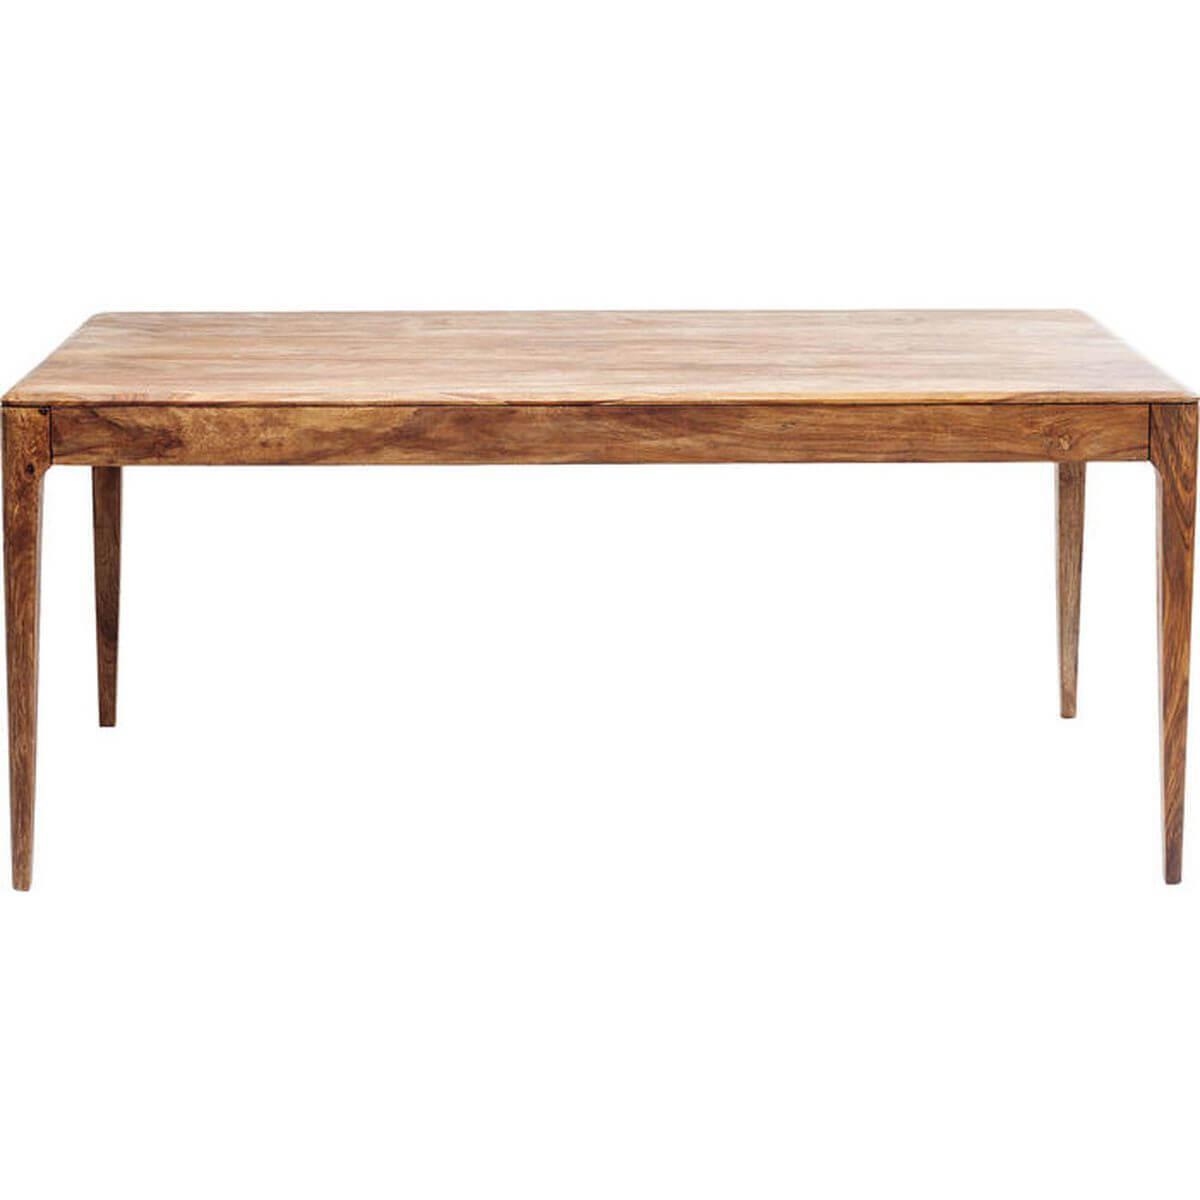 Table Brooklyn Nature Kare Design 175x90cm